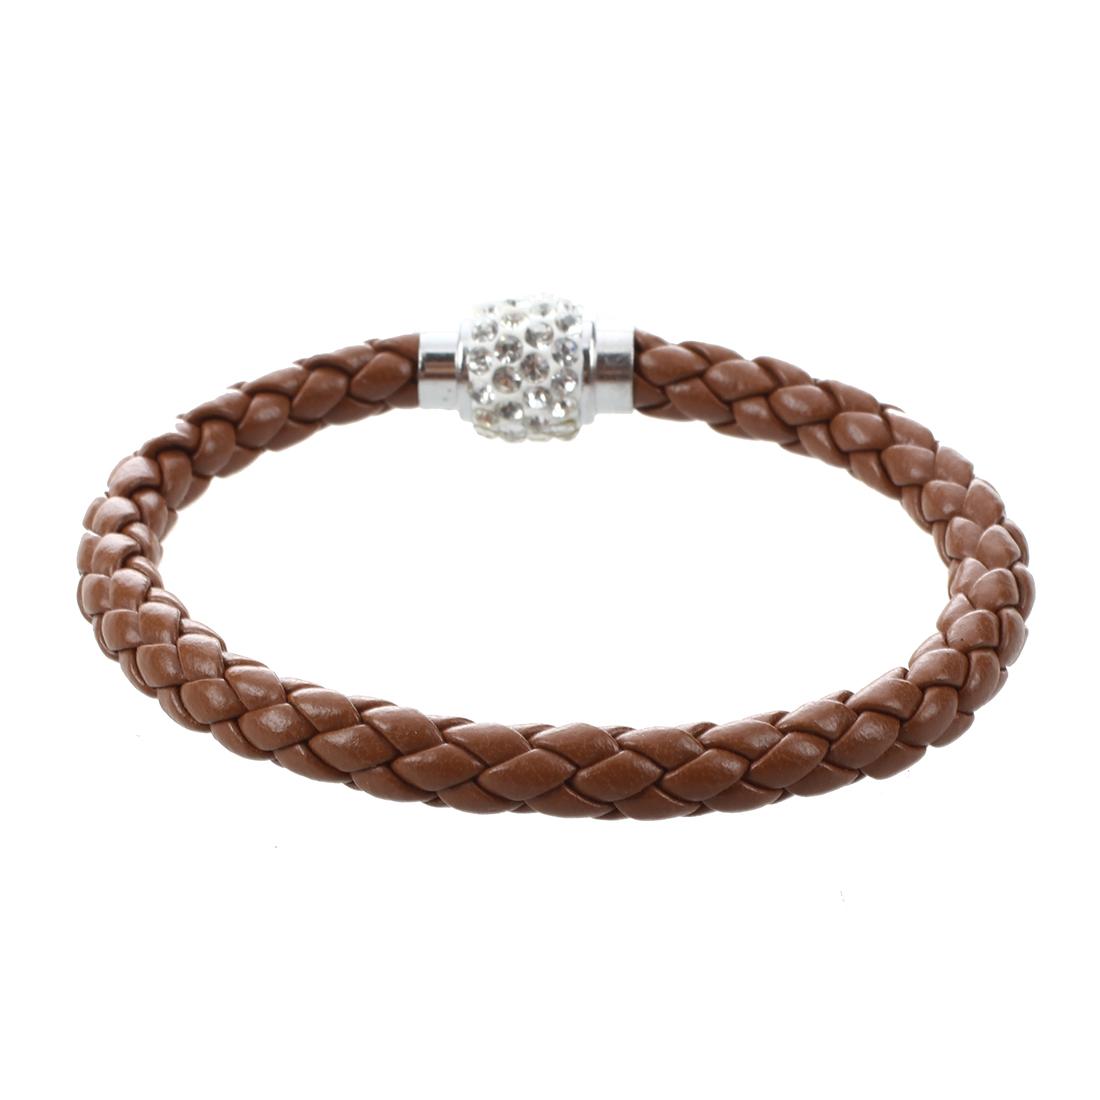 frauen maenner armband wristband schnur leder geflochten kristall ball gesc z6y6 ebay. Black Bedroom Furniture Sets. Home Design Ideas